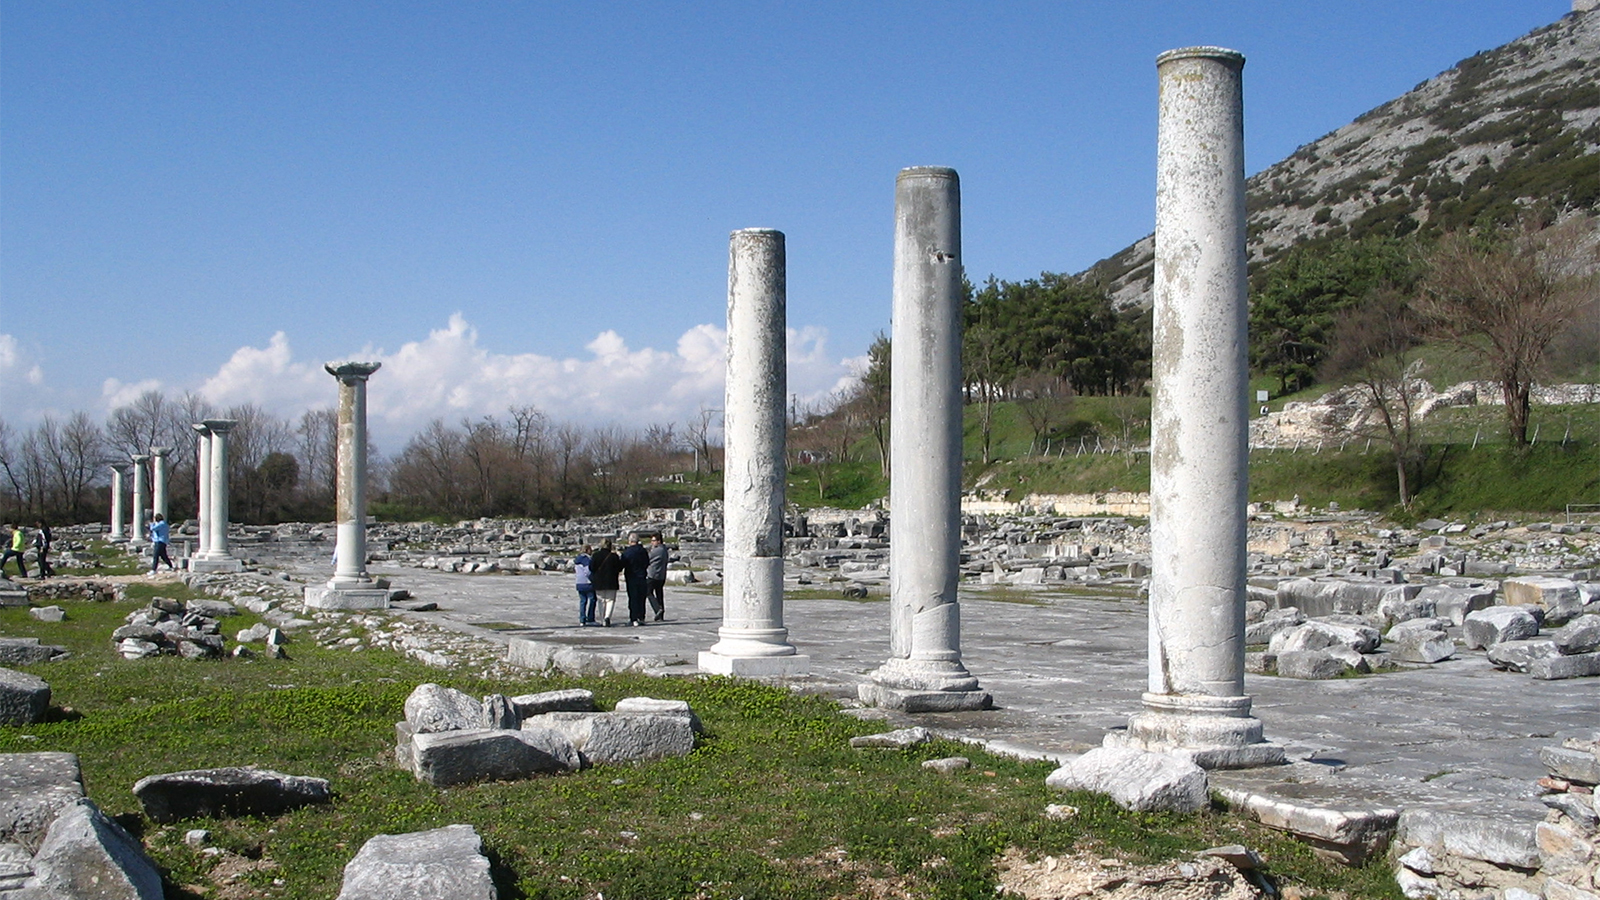 Le portique de l'agora de Philippes, en Grèce - © Ian W. Scott